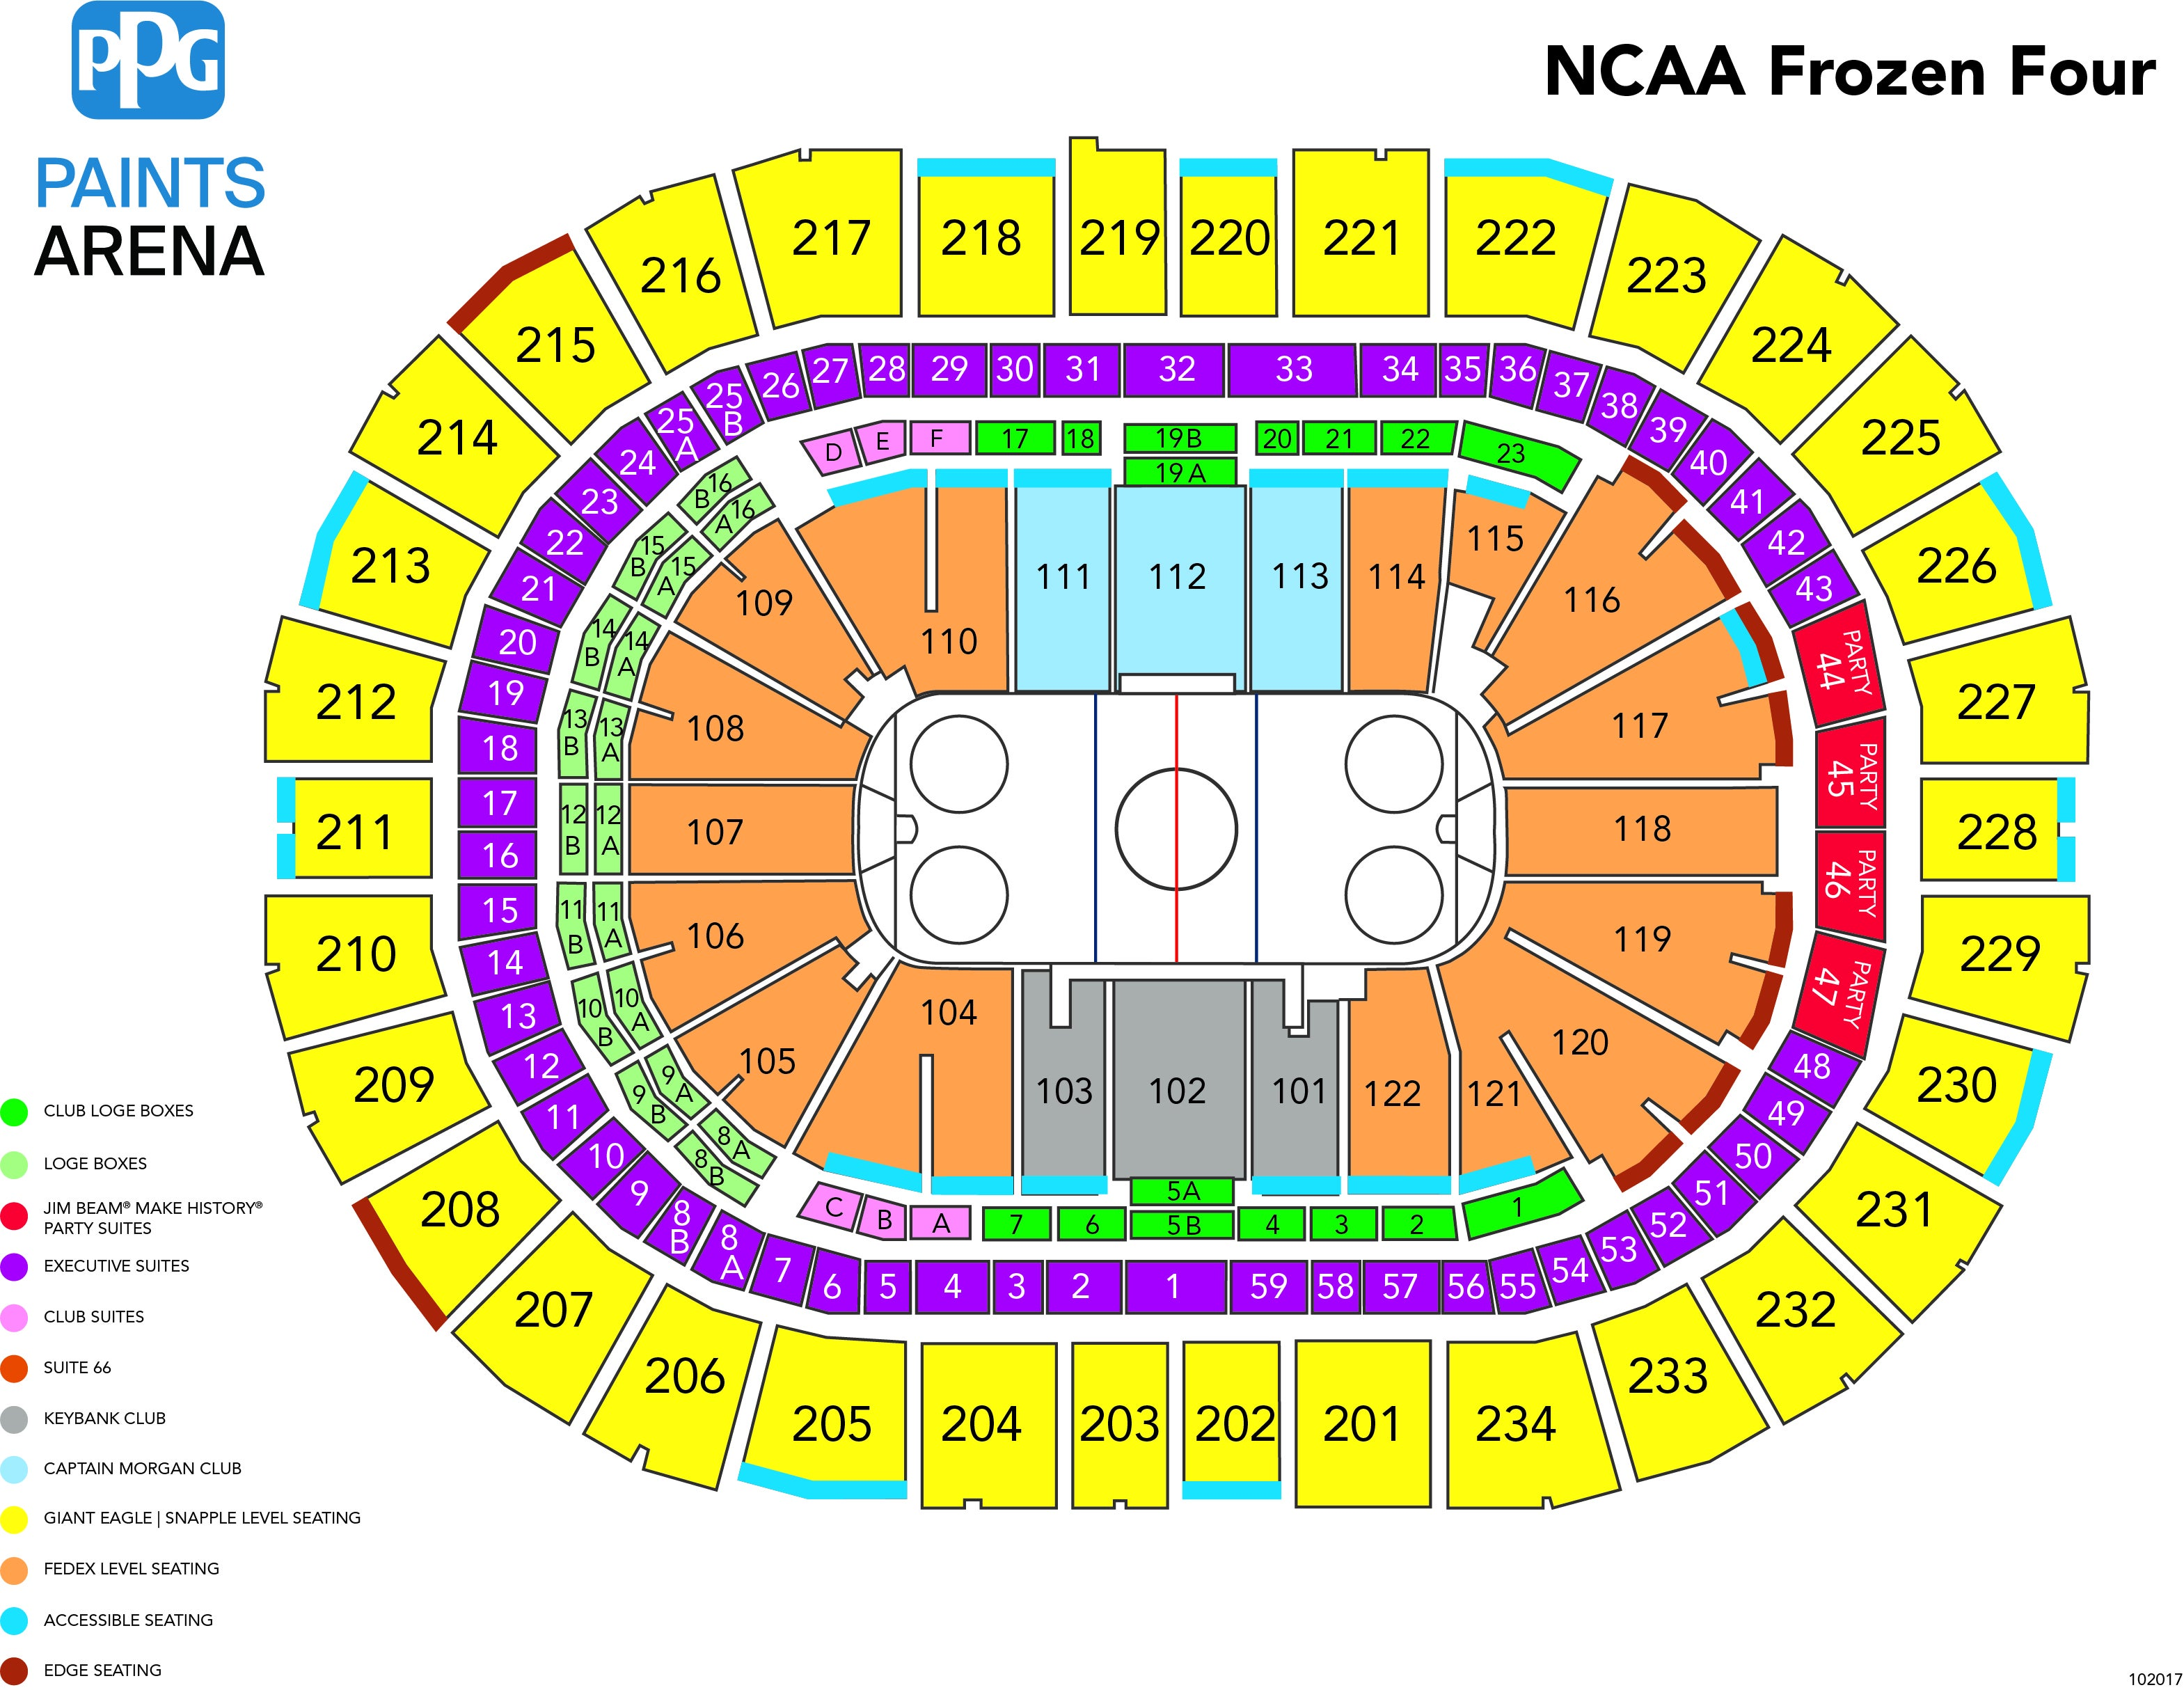 Pitt Vs Duquesne Club Hockey Ppg Paints Arena